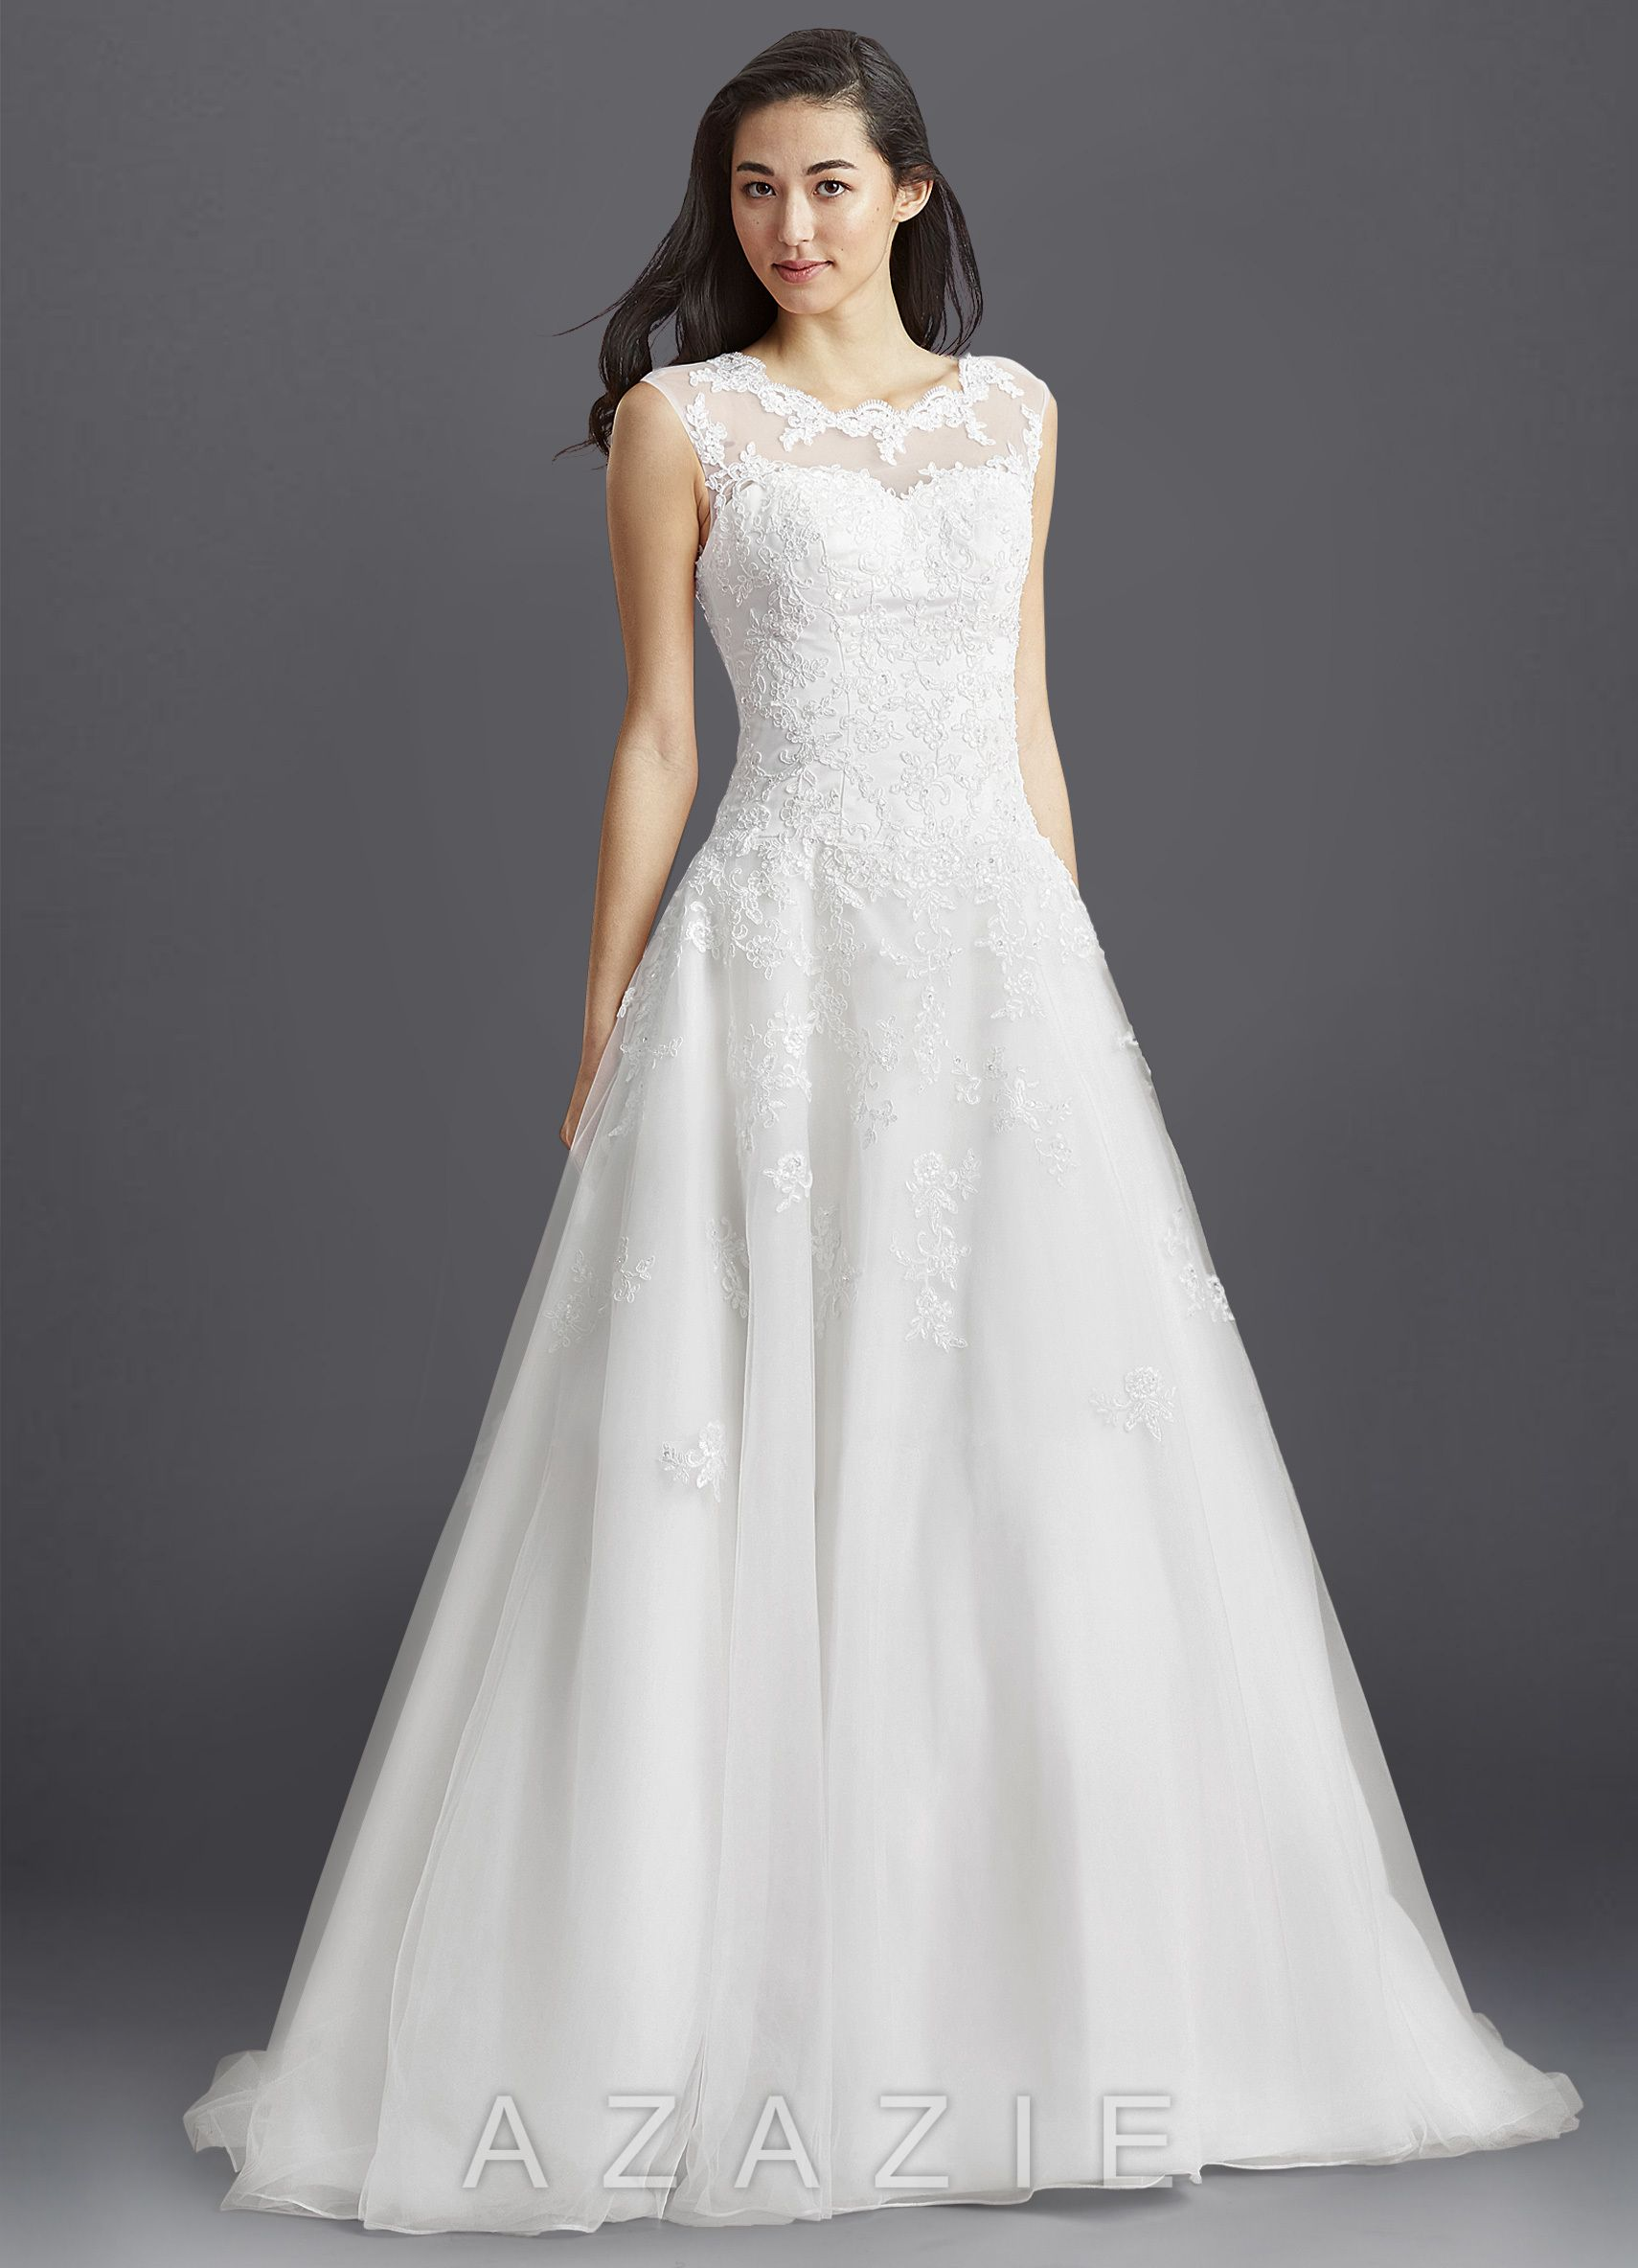 Fantasia Bg Wedding Dress